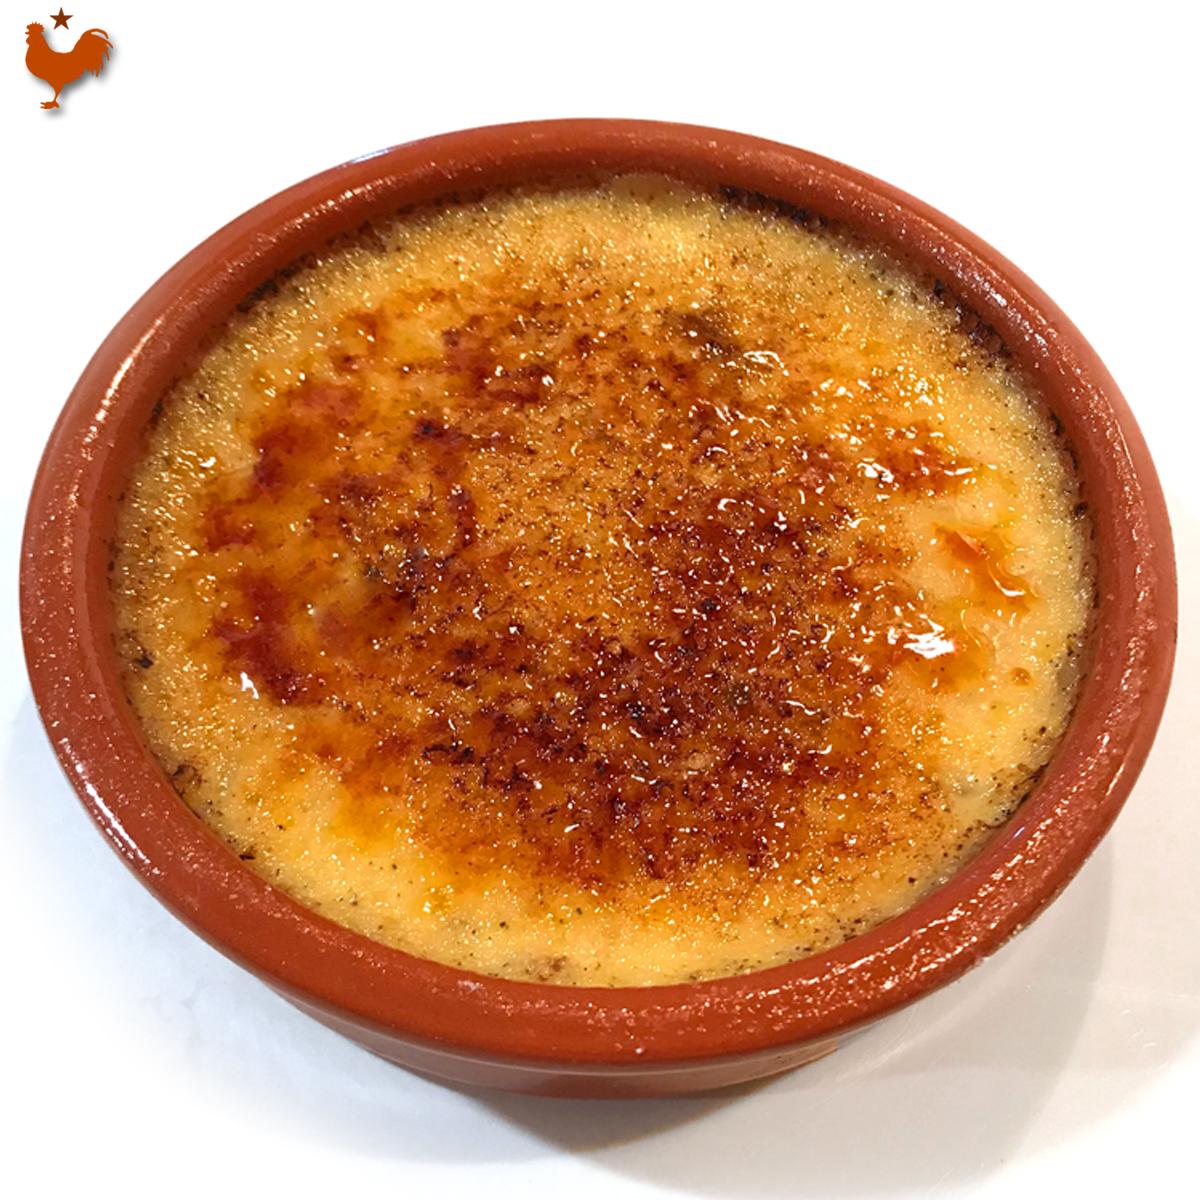 Pierre Hermé's Vanilla Crème Brûlée